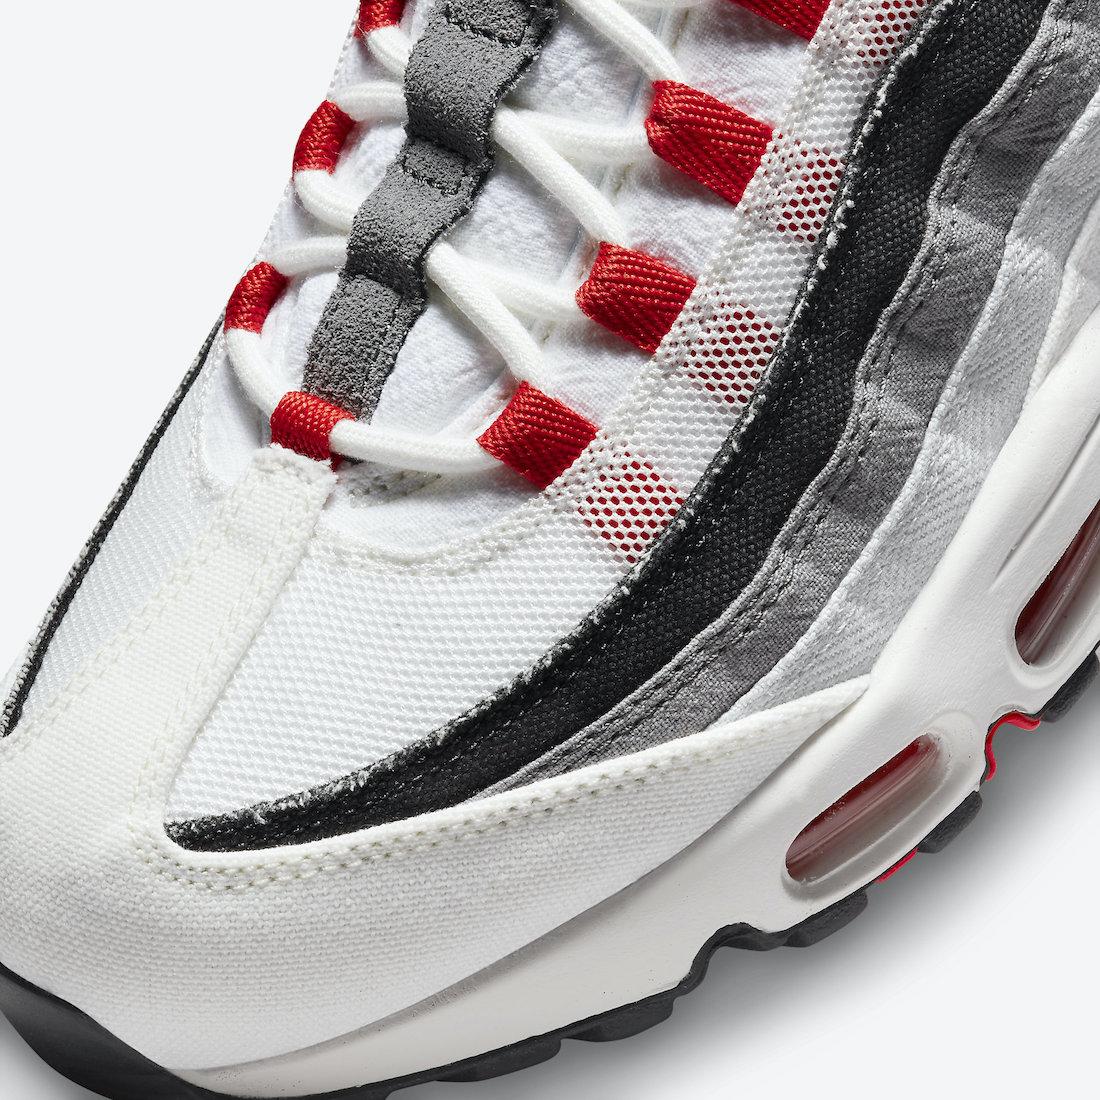 Nike-Air-Max-95-Japan-DH9792-100-Release-Date-6